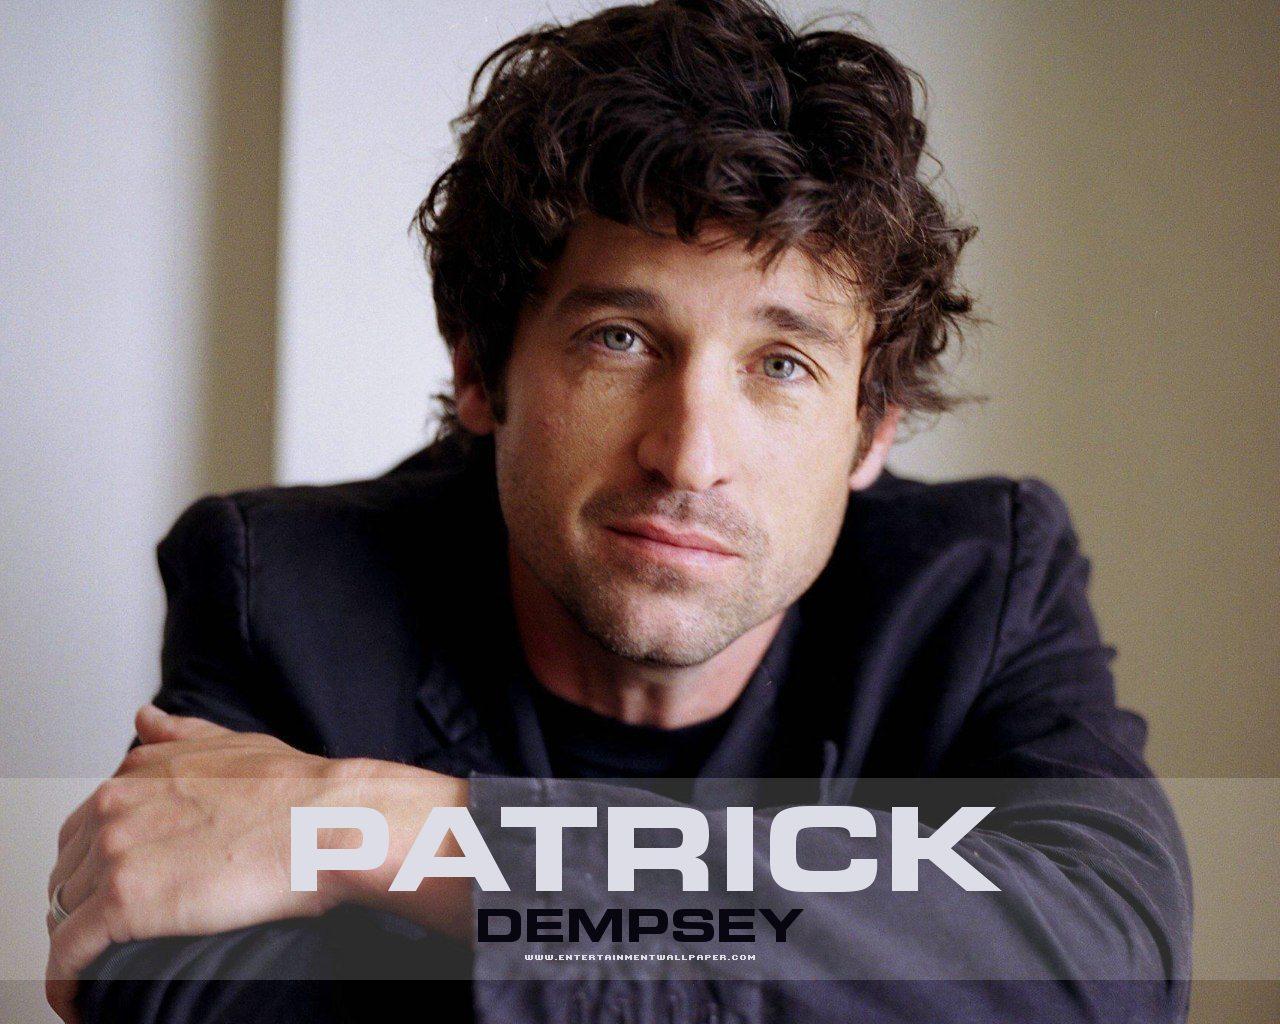 Patrick Dempsey Wallpaper - Original size, download now.